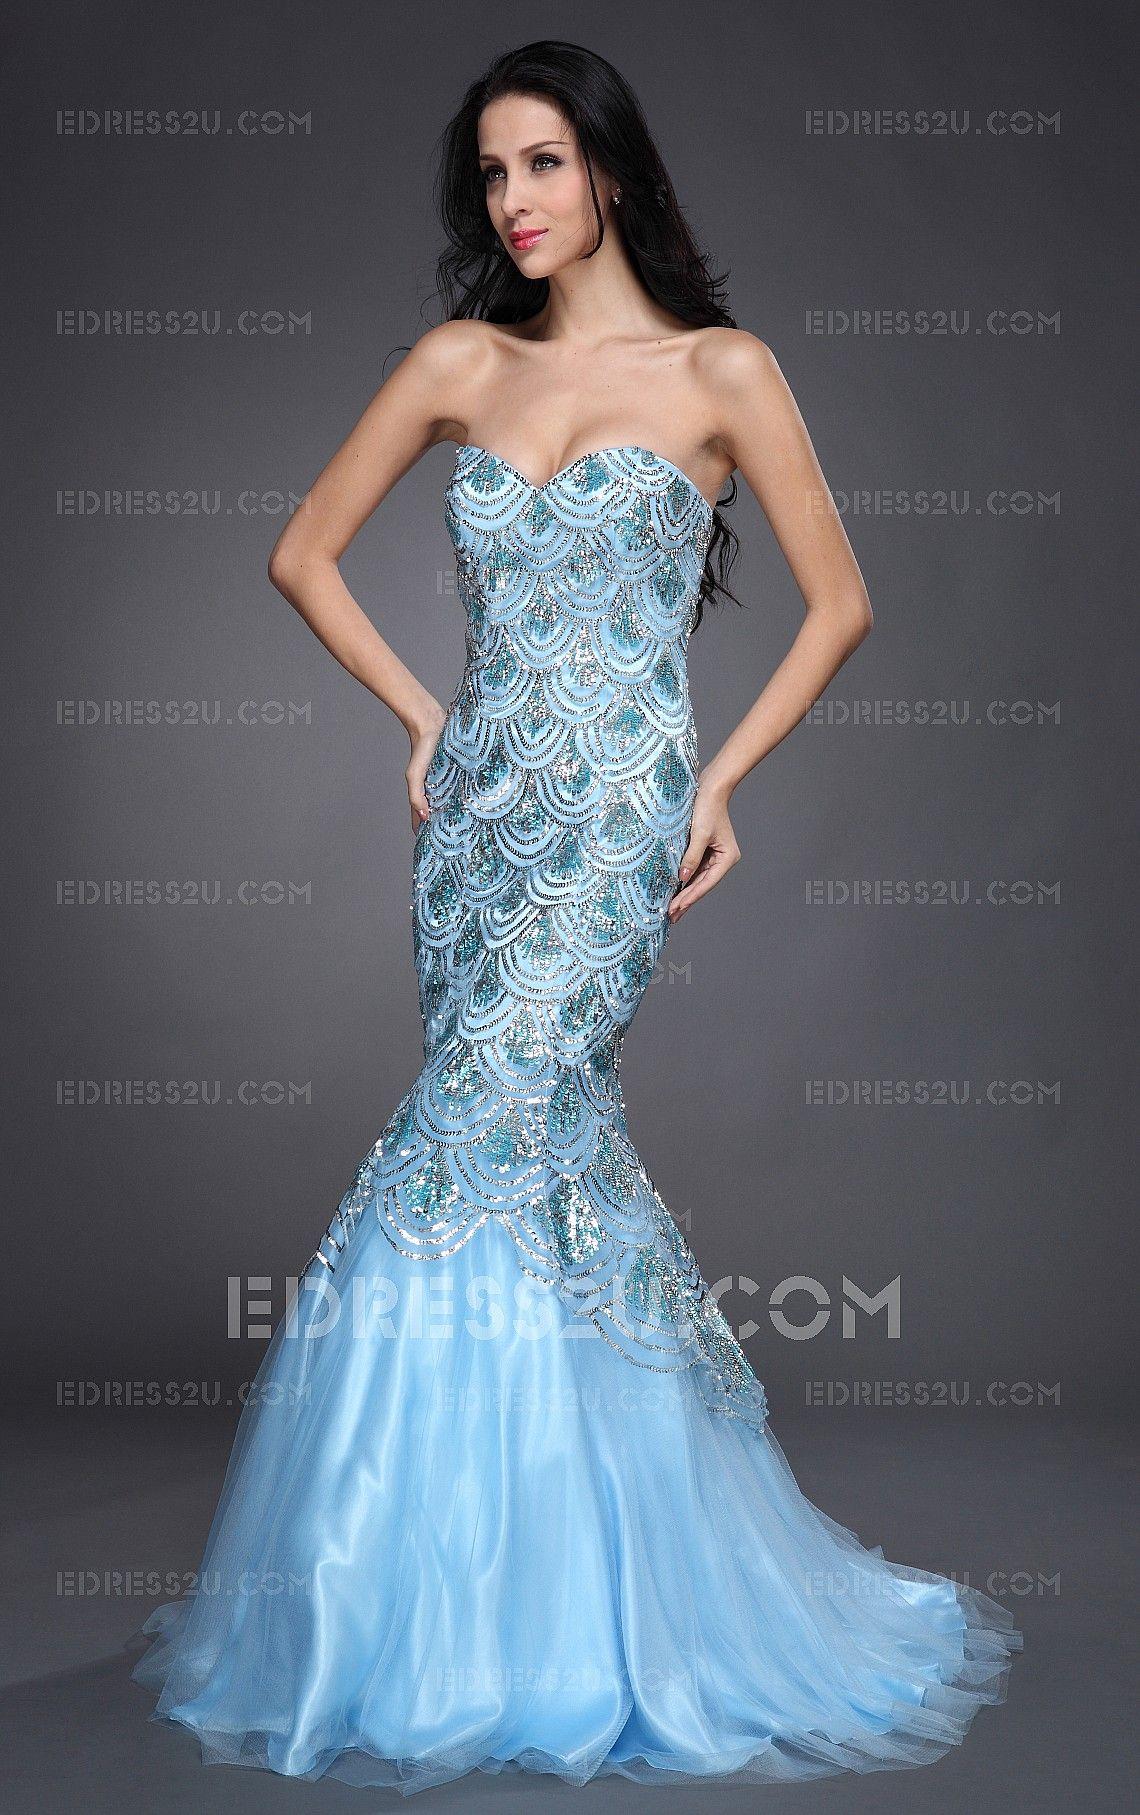 Scale Mermaid Sweetheart Floor-length Dress | Prom | Pinterest ...